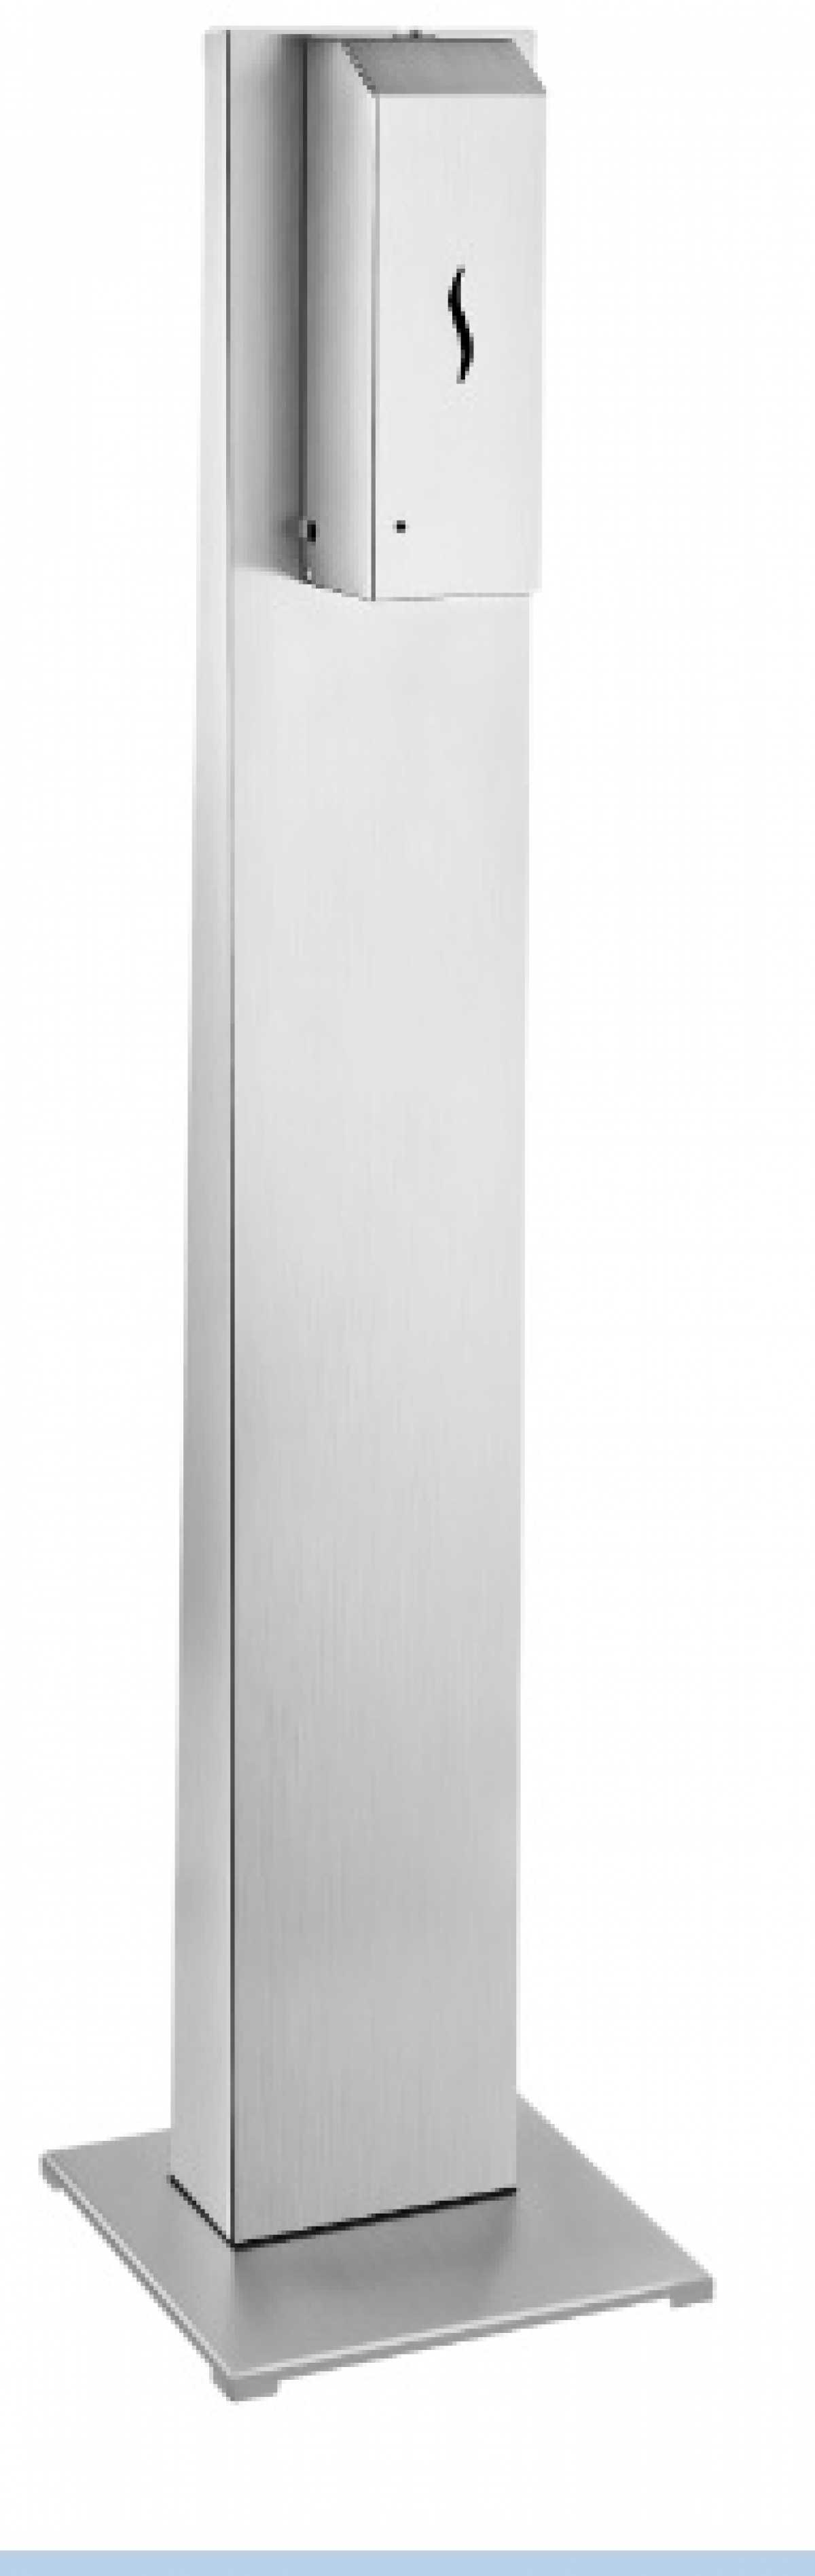 Fotoselli Dispenser - Standıyla birlikte